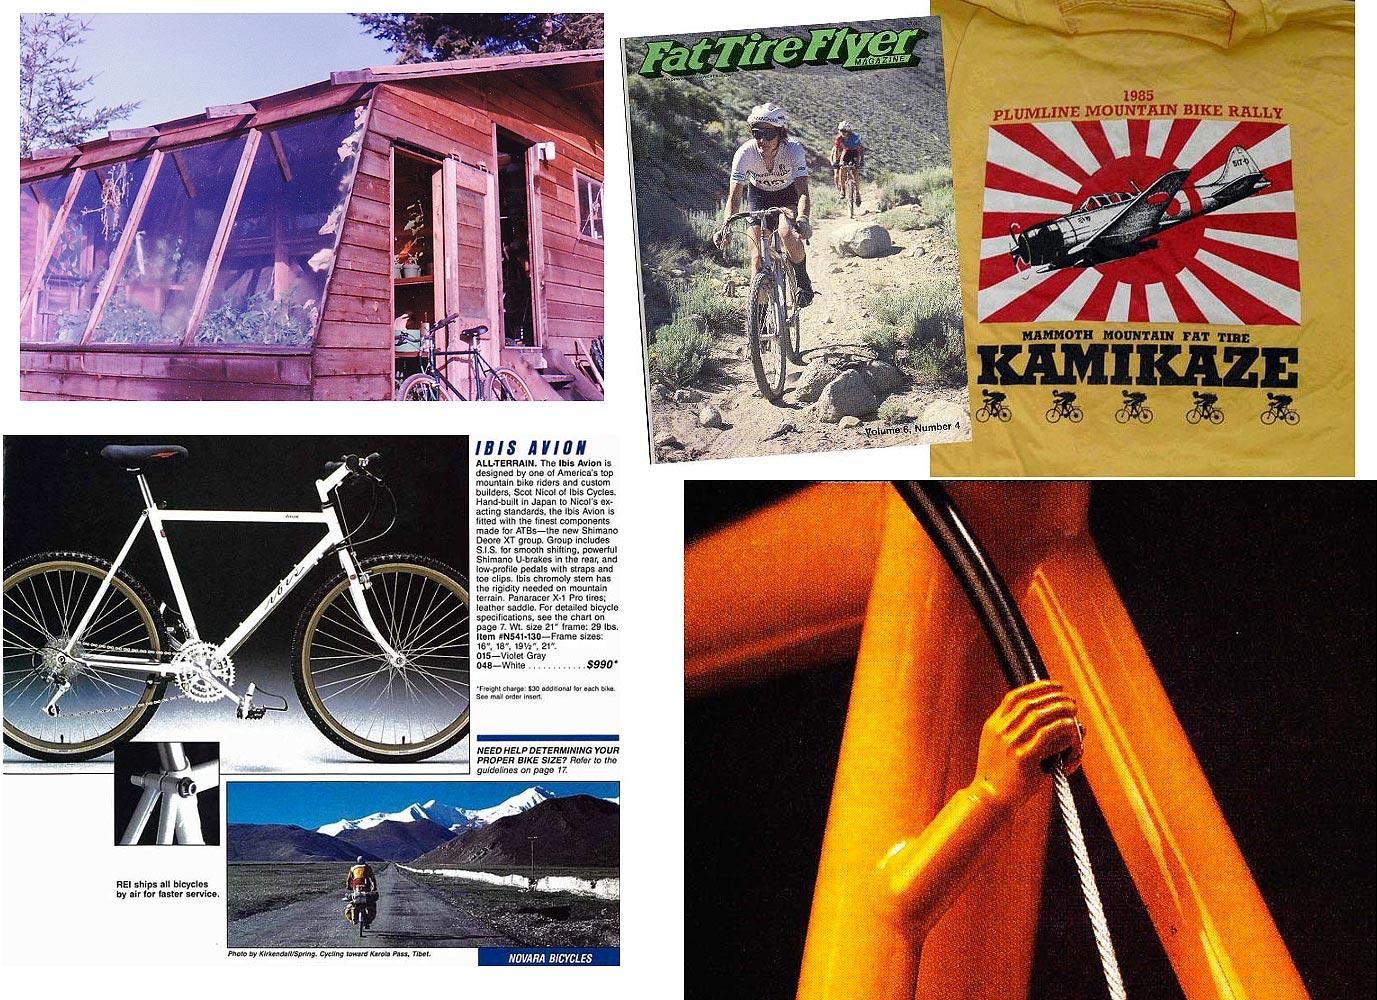 Test du vélo de gravel Häkka de IBIS